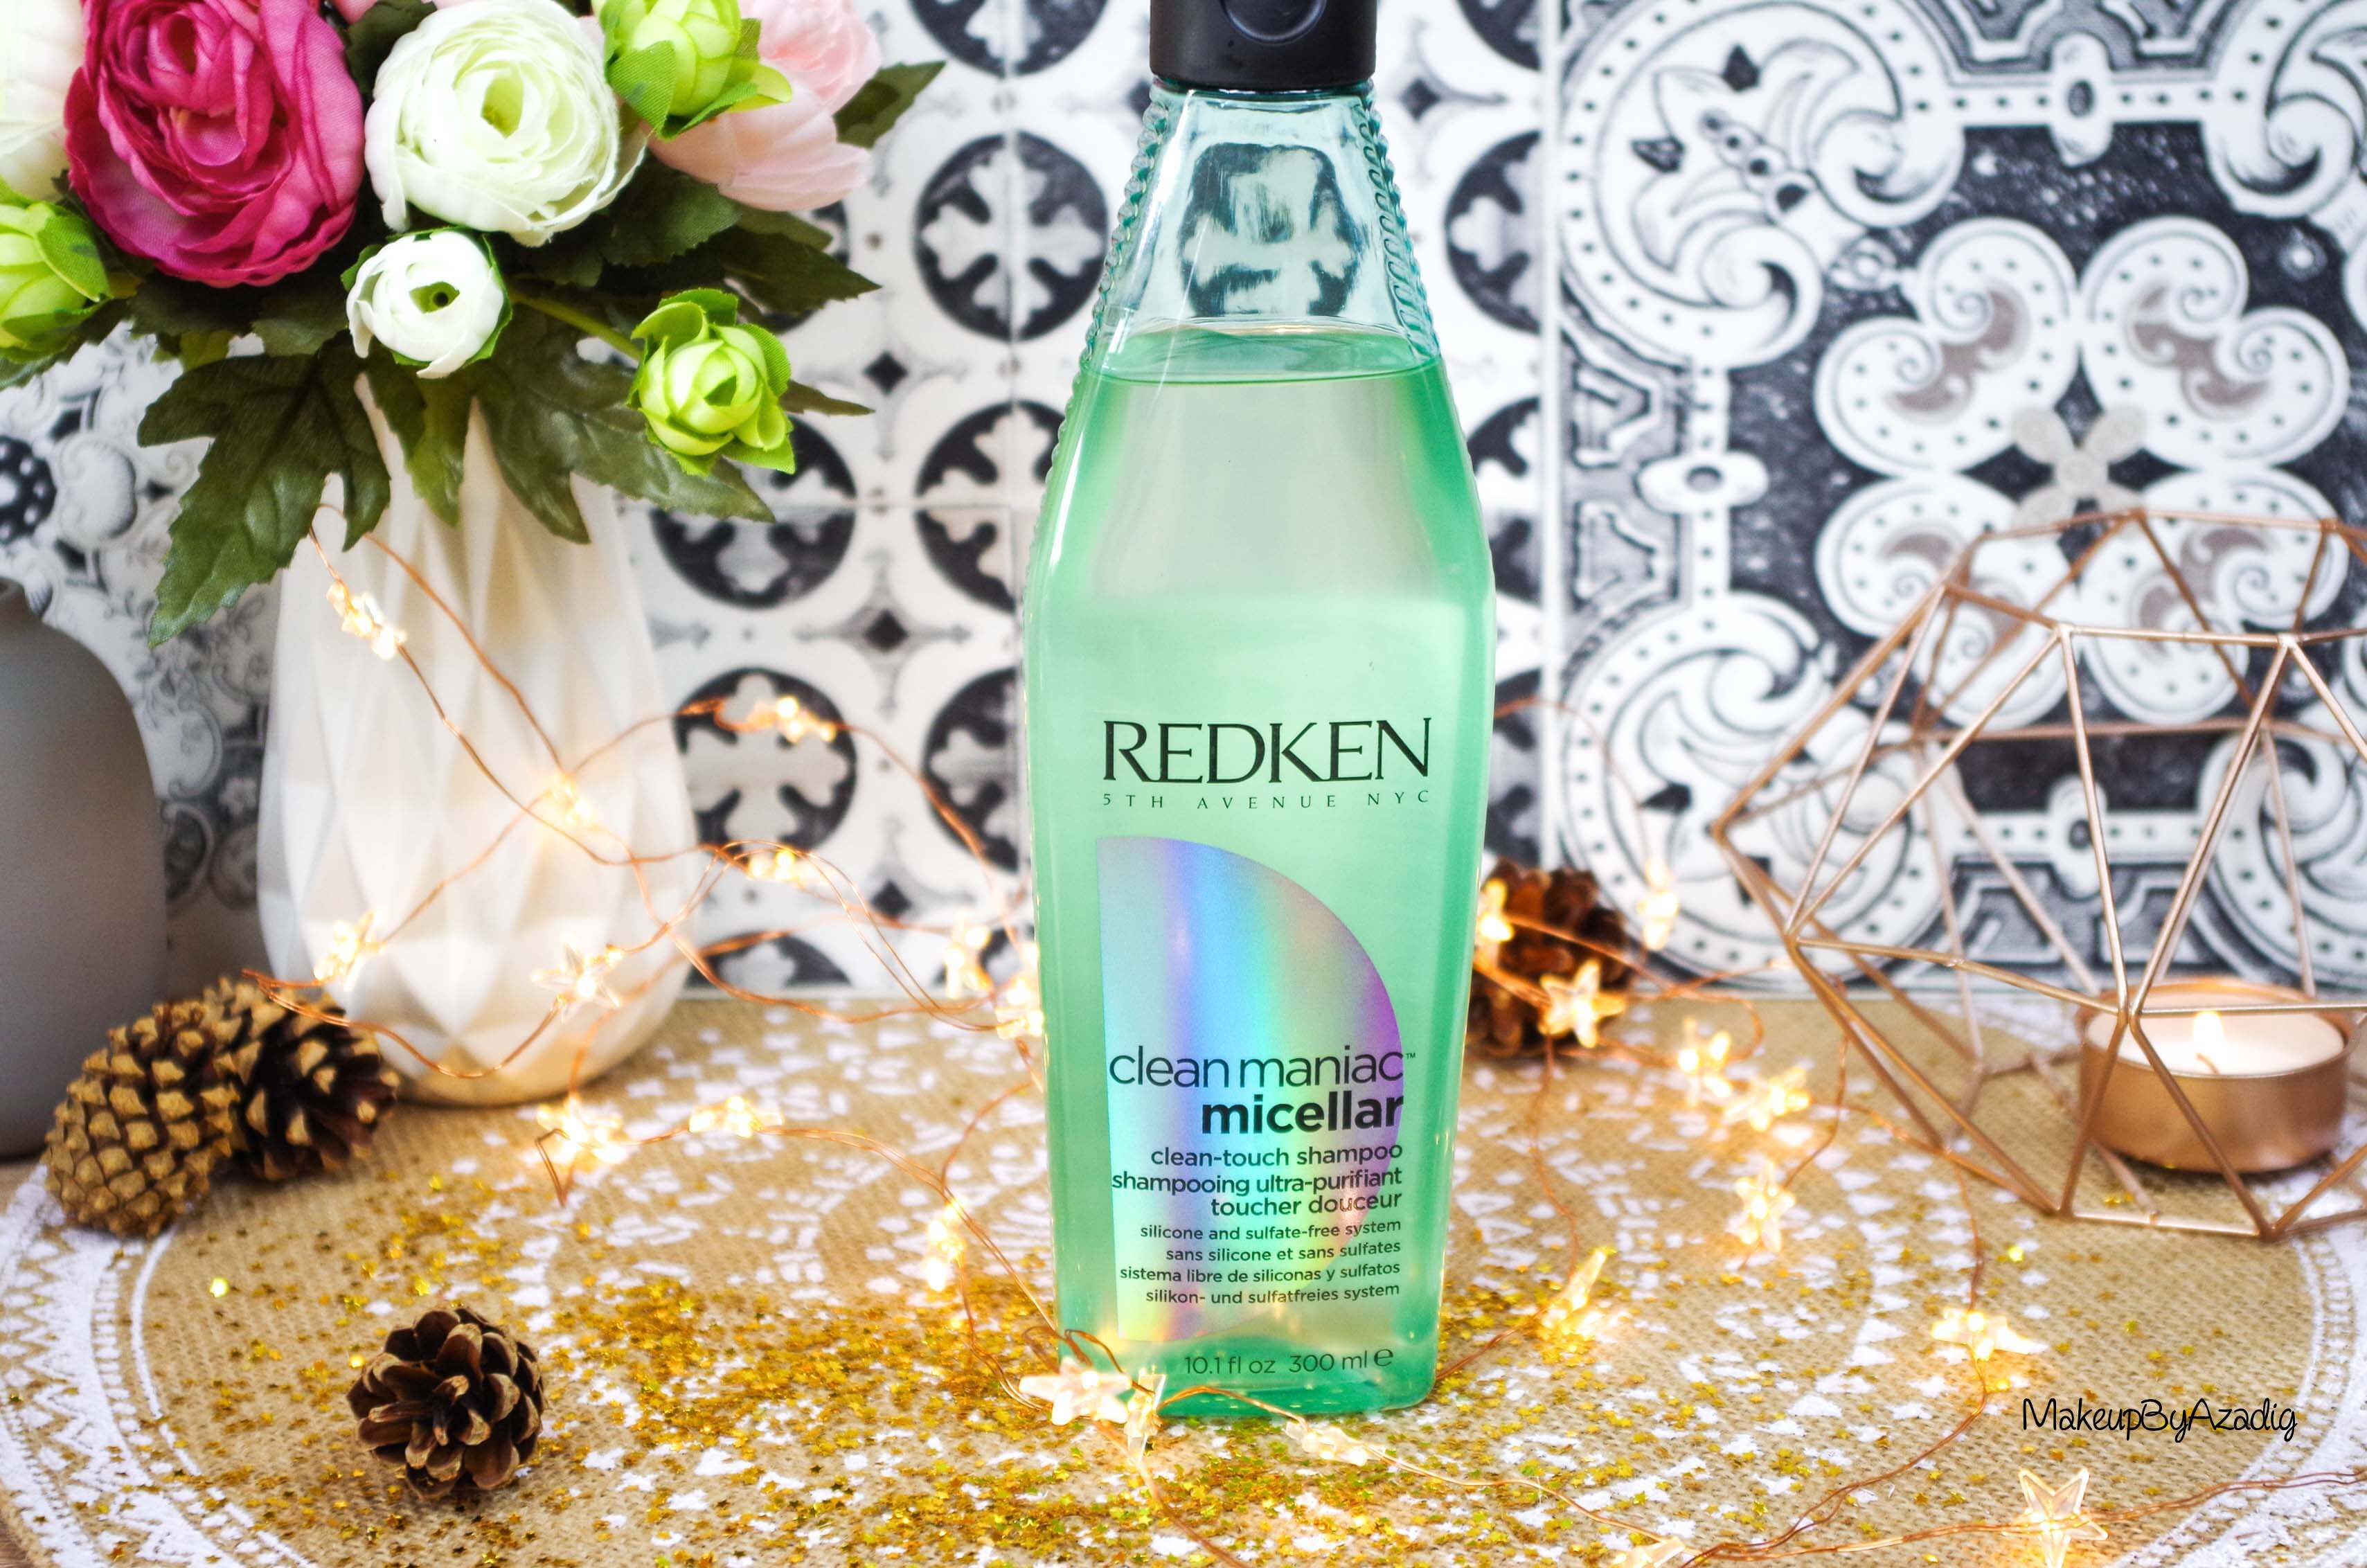 revue-shampooing-conditioner-clean-maniac-redken-programme-detox-anti-pollution-makeupbyazadig-cleanhair-sans-silicone-sulfate-free